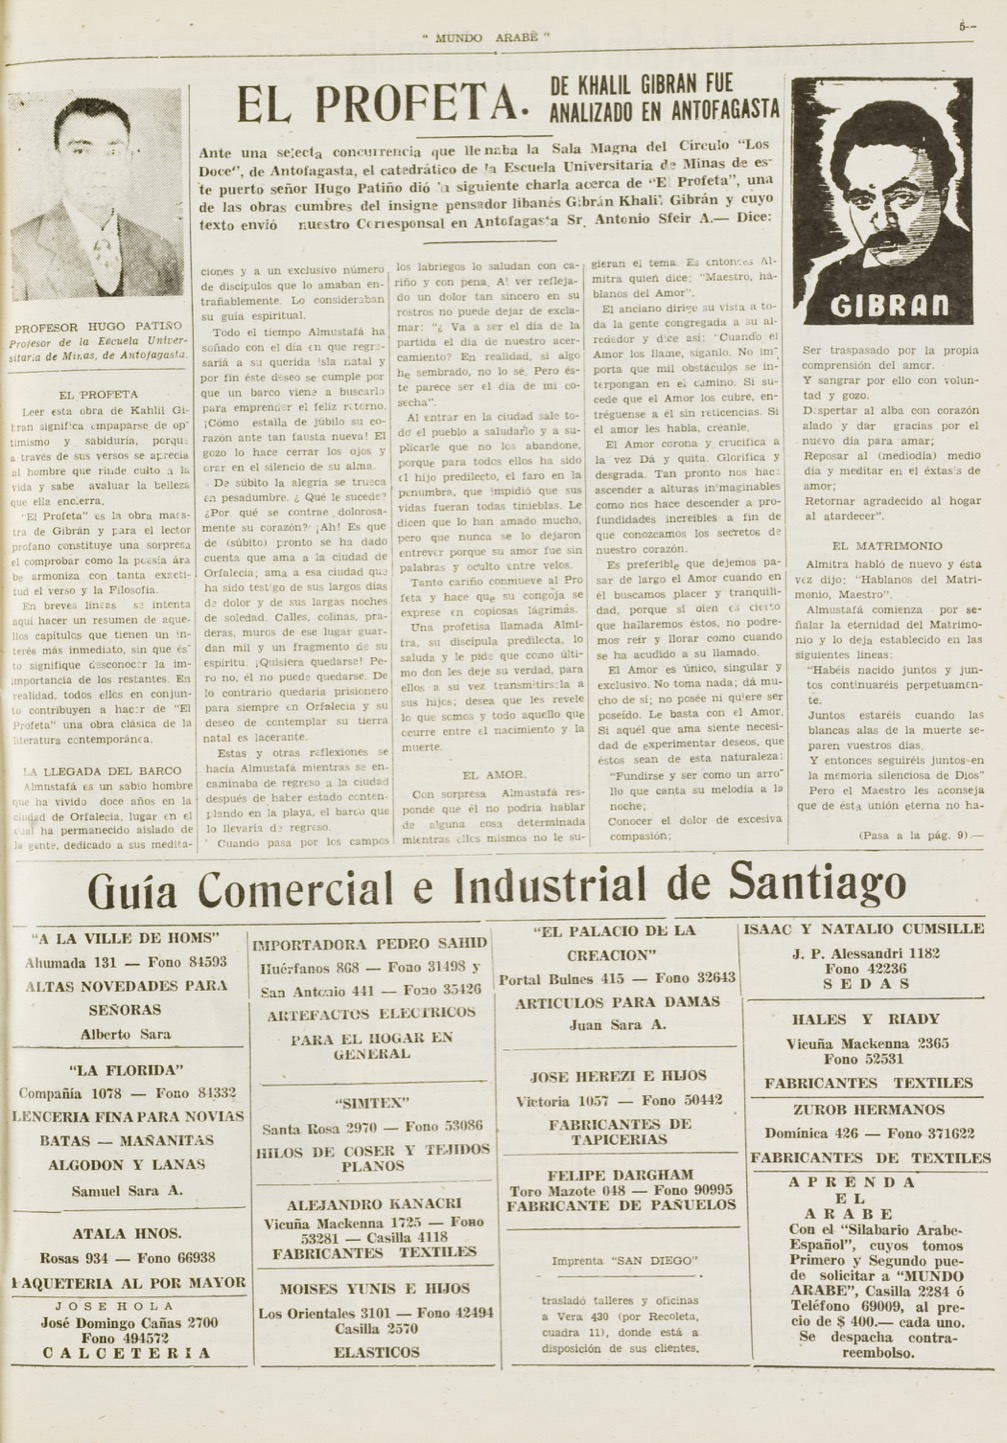 """El Profeta de Khalil Gibrán fue analizado en Antofagasta"", Mundo Árabe, Jun 30, 1955, pp. 5,8."